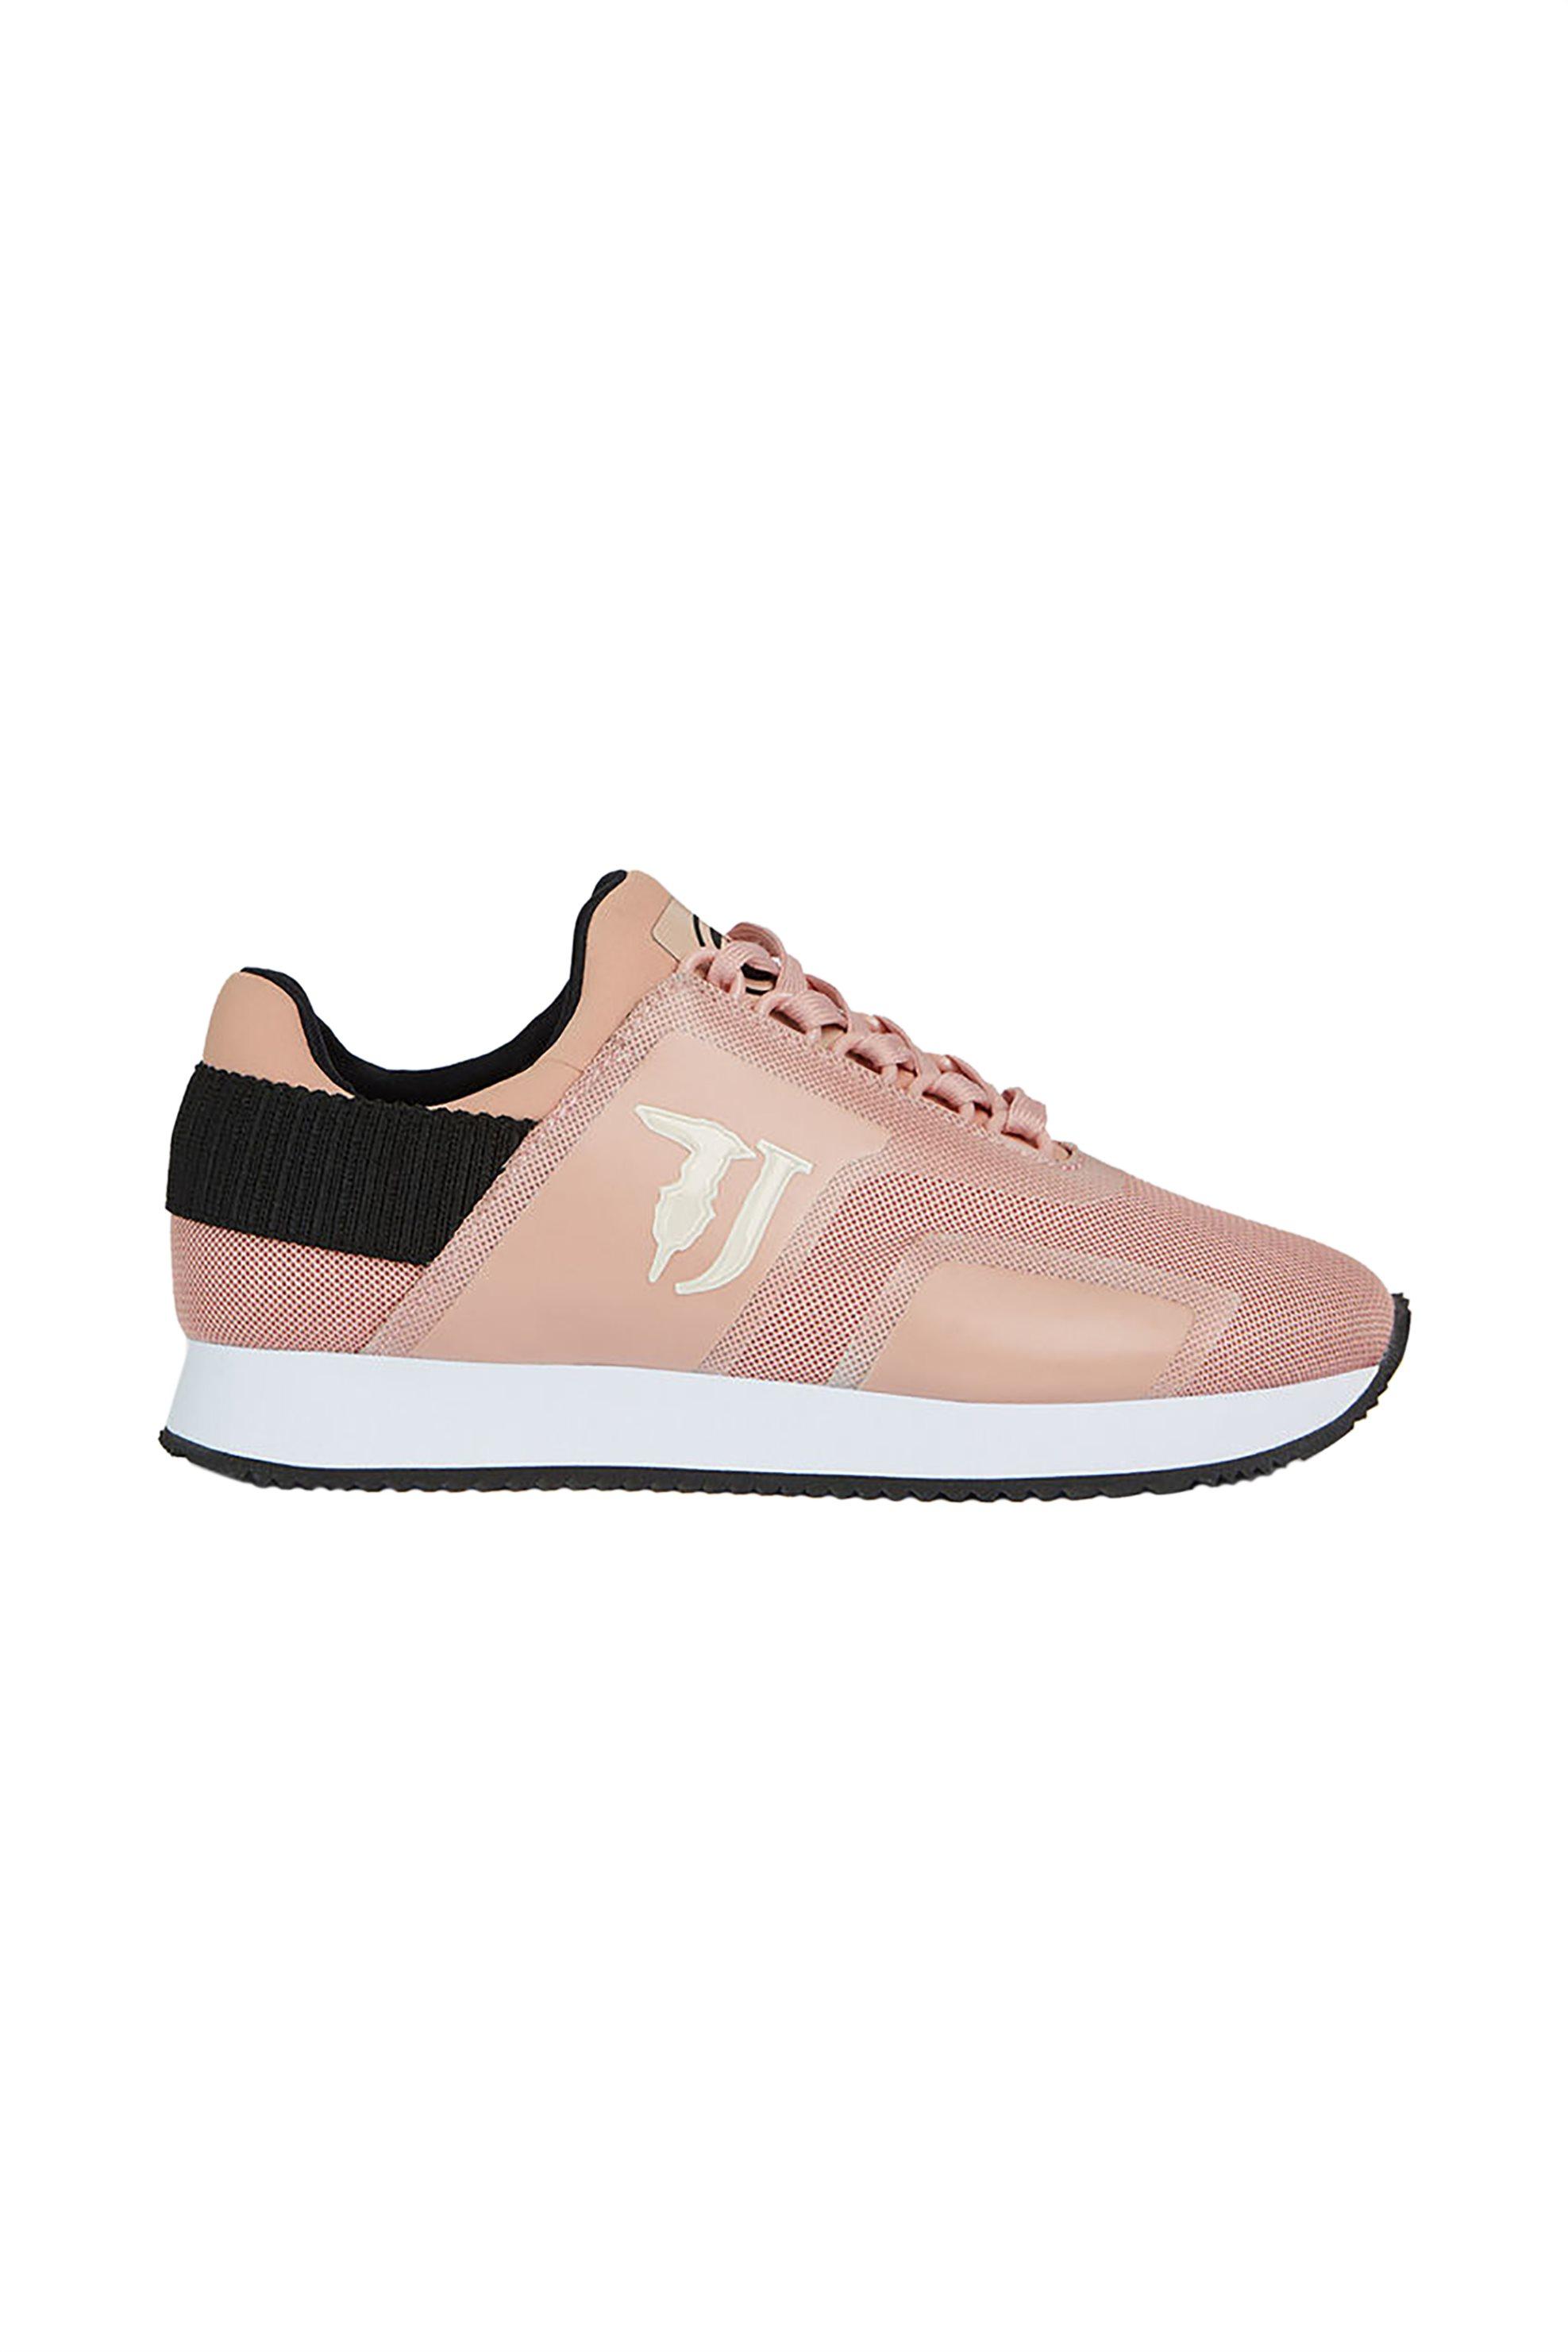 Trussardi Jeans γυναικεία sneakers με mesh ύφασμα Shiny – 79A00328-9Y099999 – Ροζ